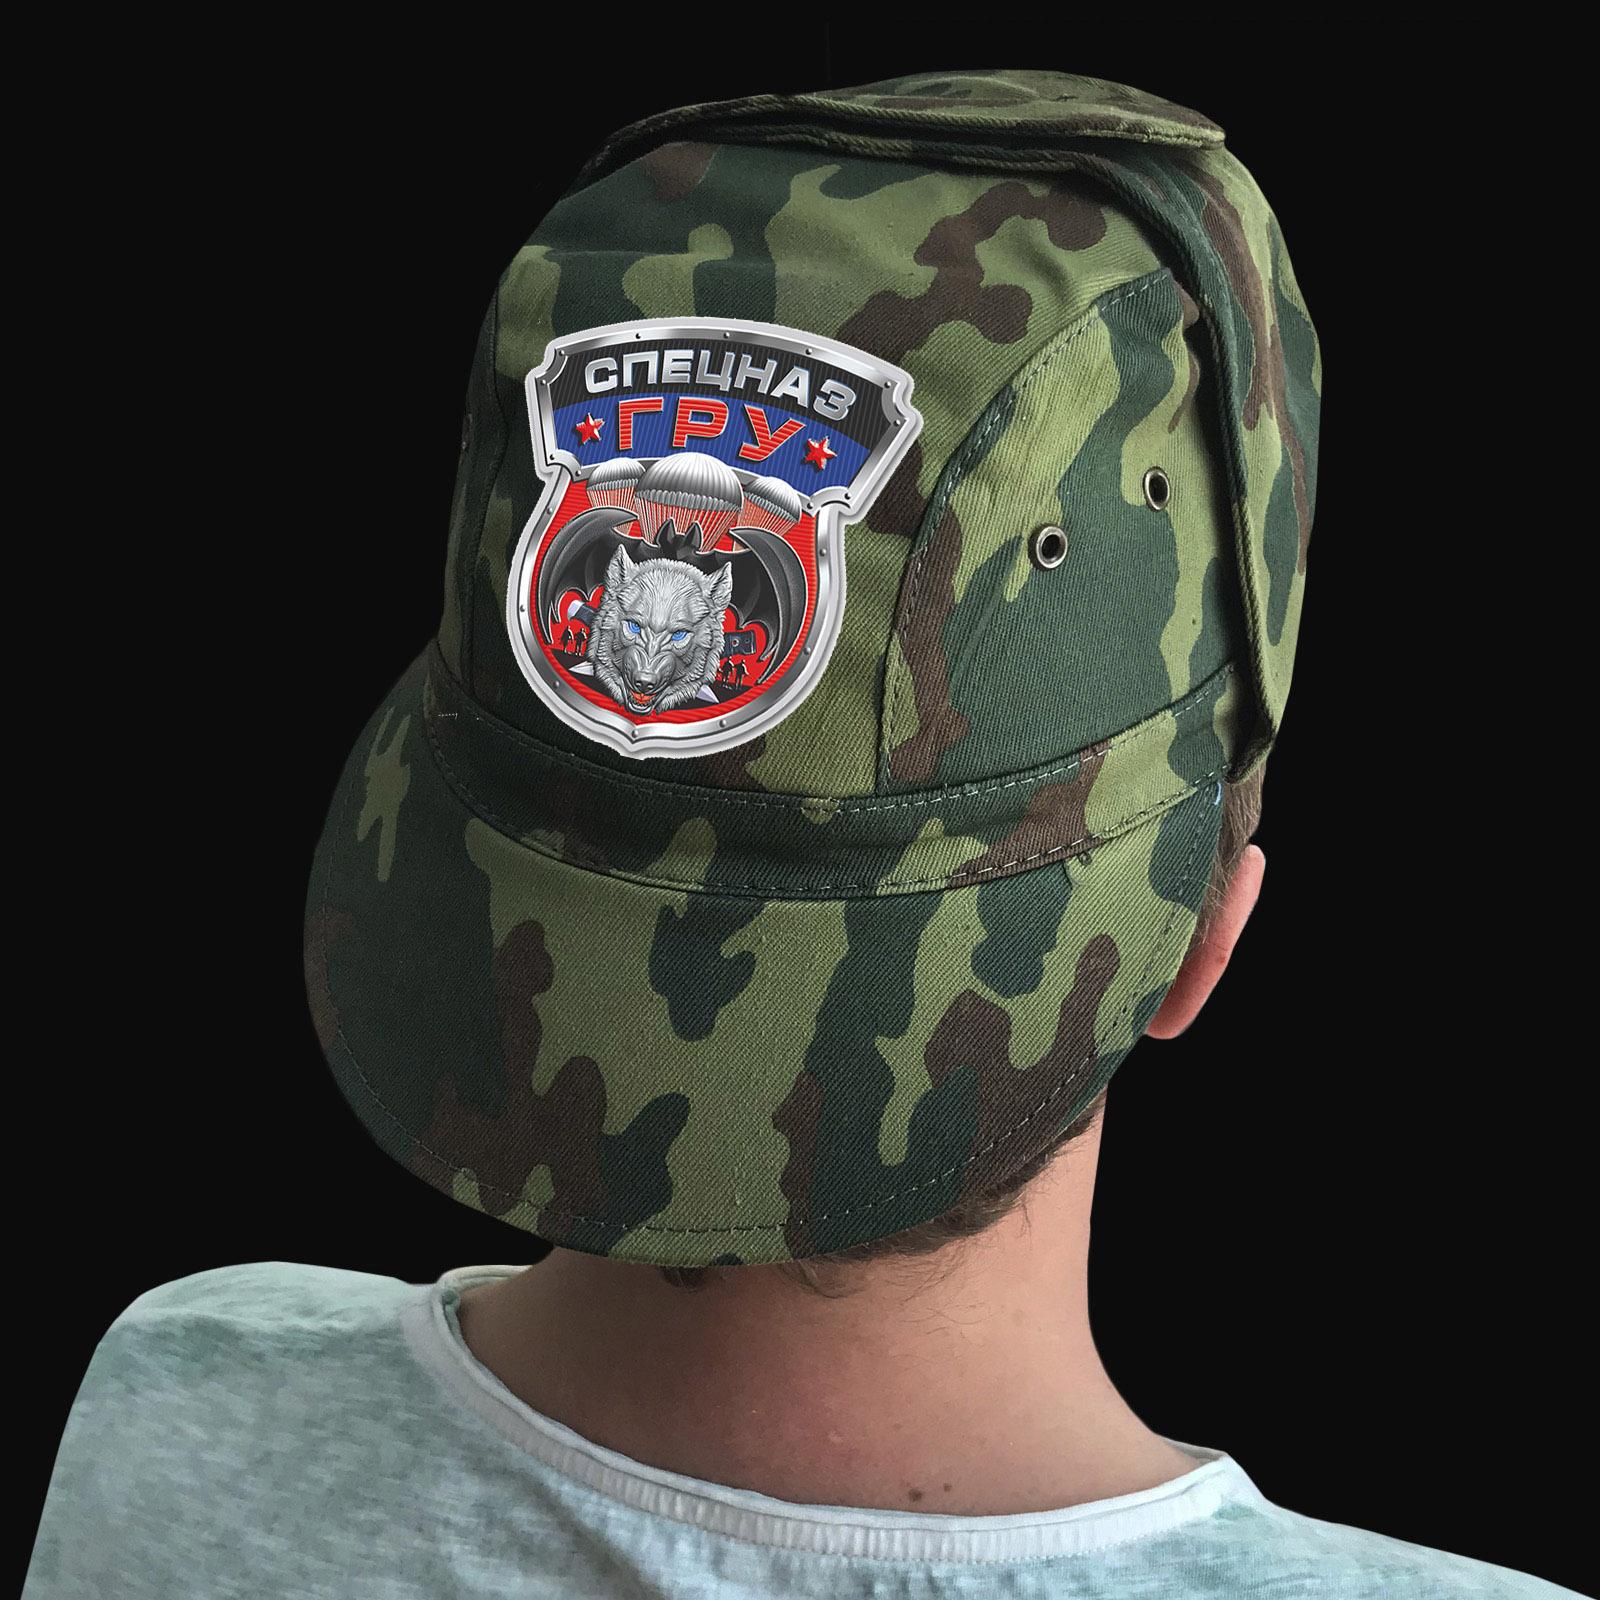 Заказать мужские кепки онлайн